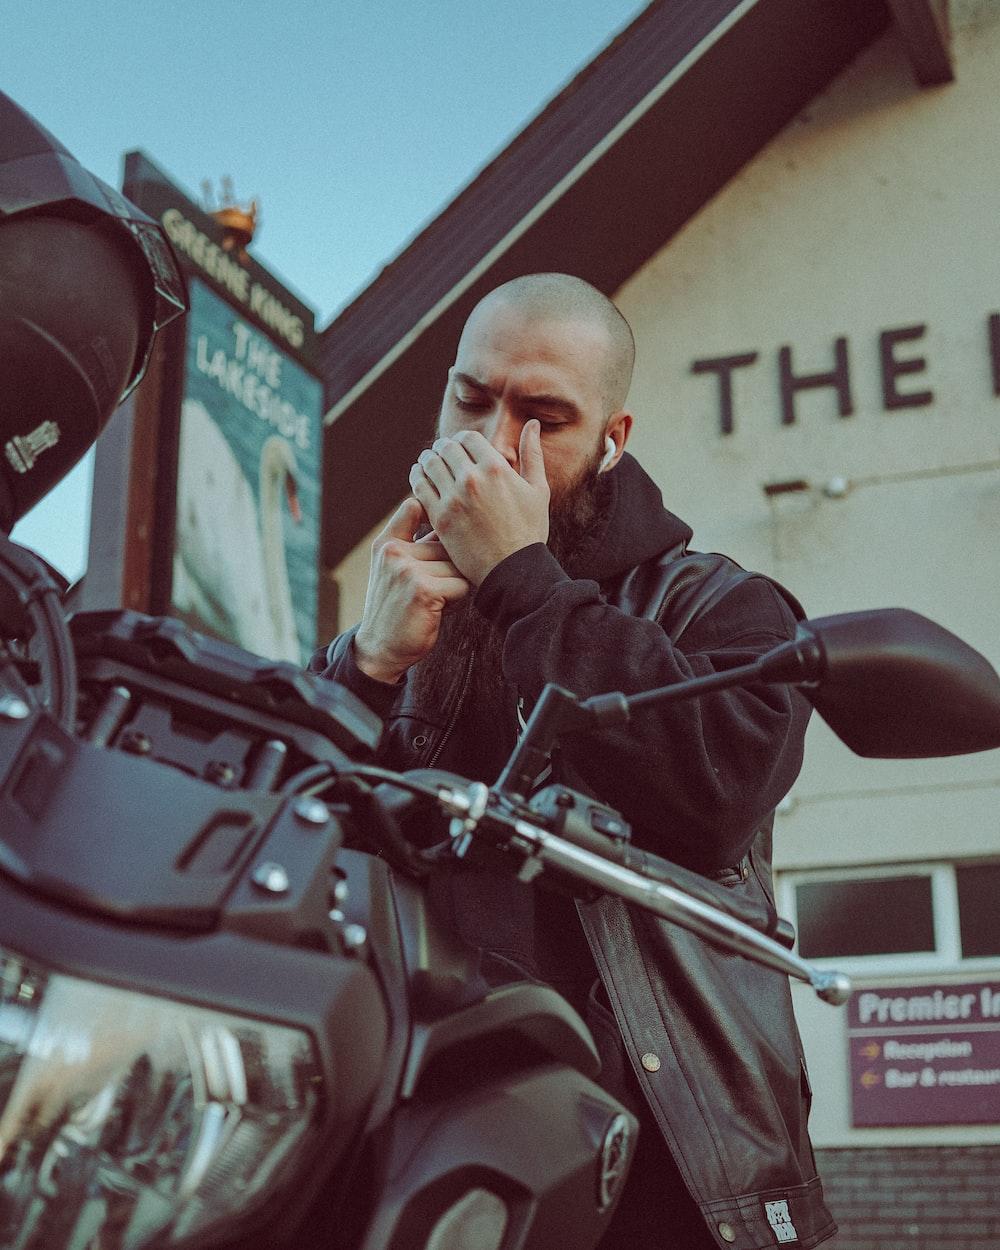 man in black jacket sitting on red motorcycle